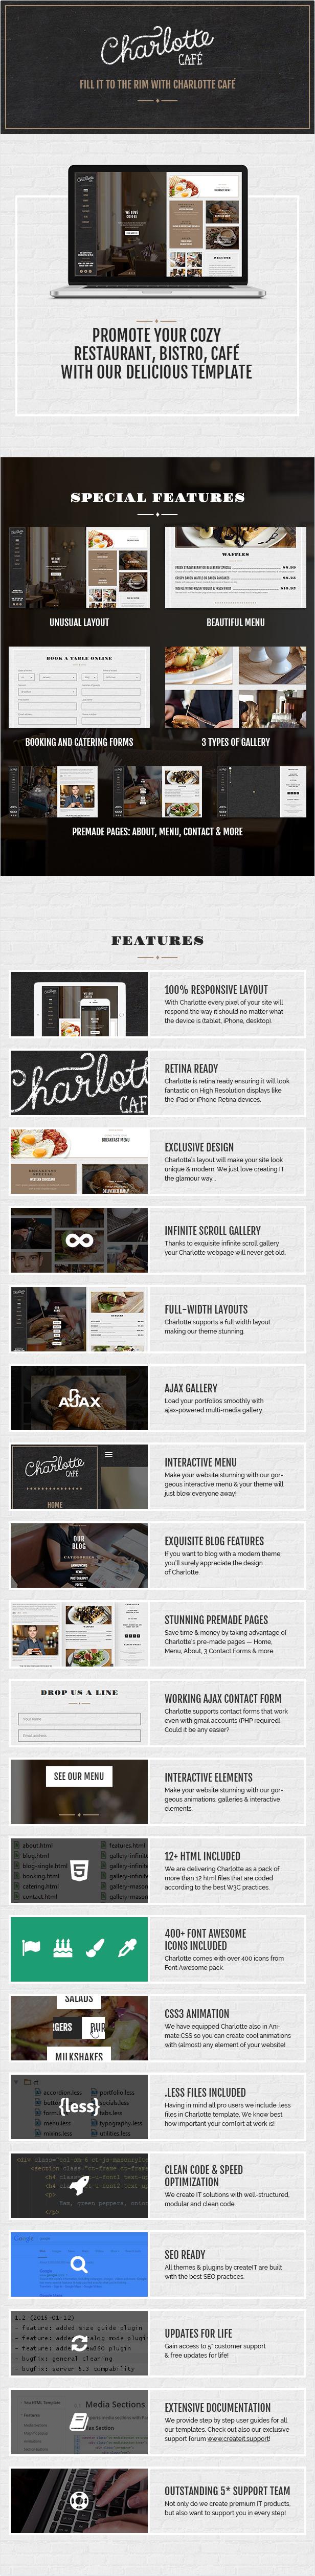 Charlotte - Café Bistro HTML Template